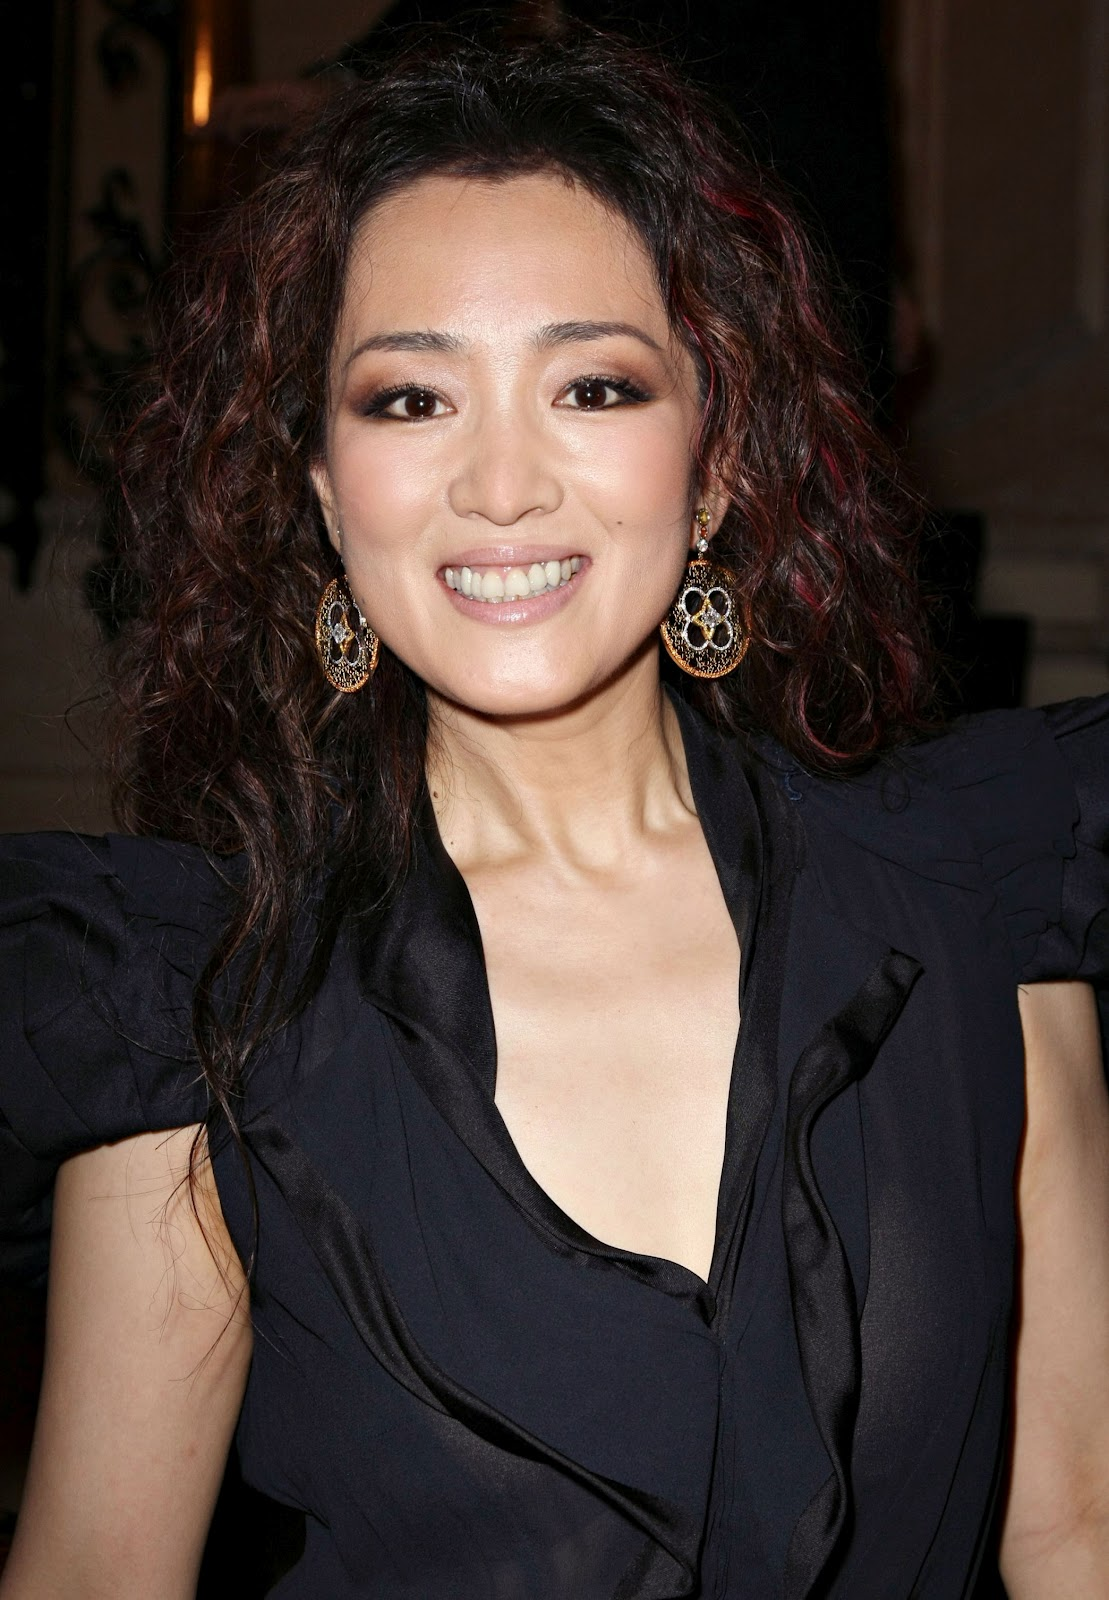 Gong Li photo gallery - high quality pics of Gong Li